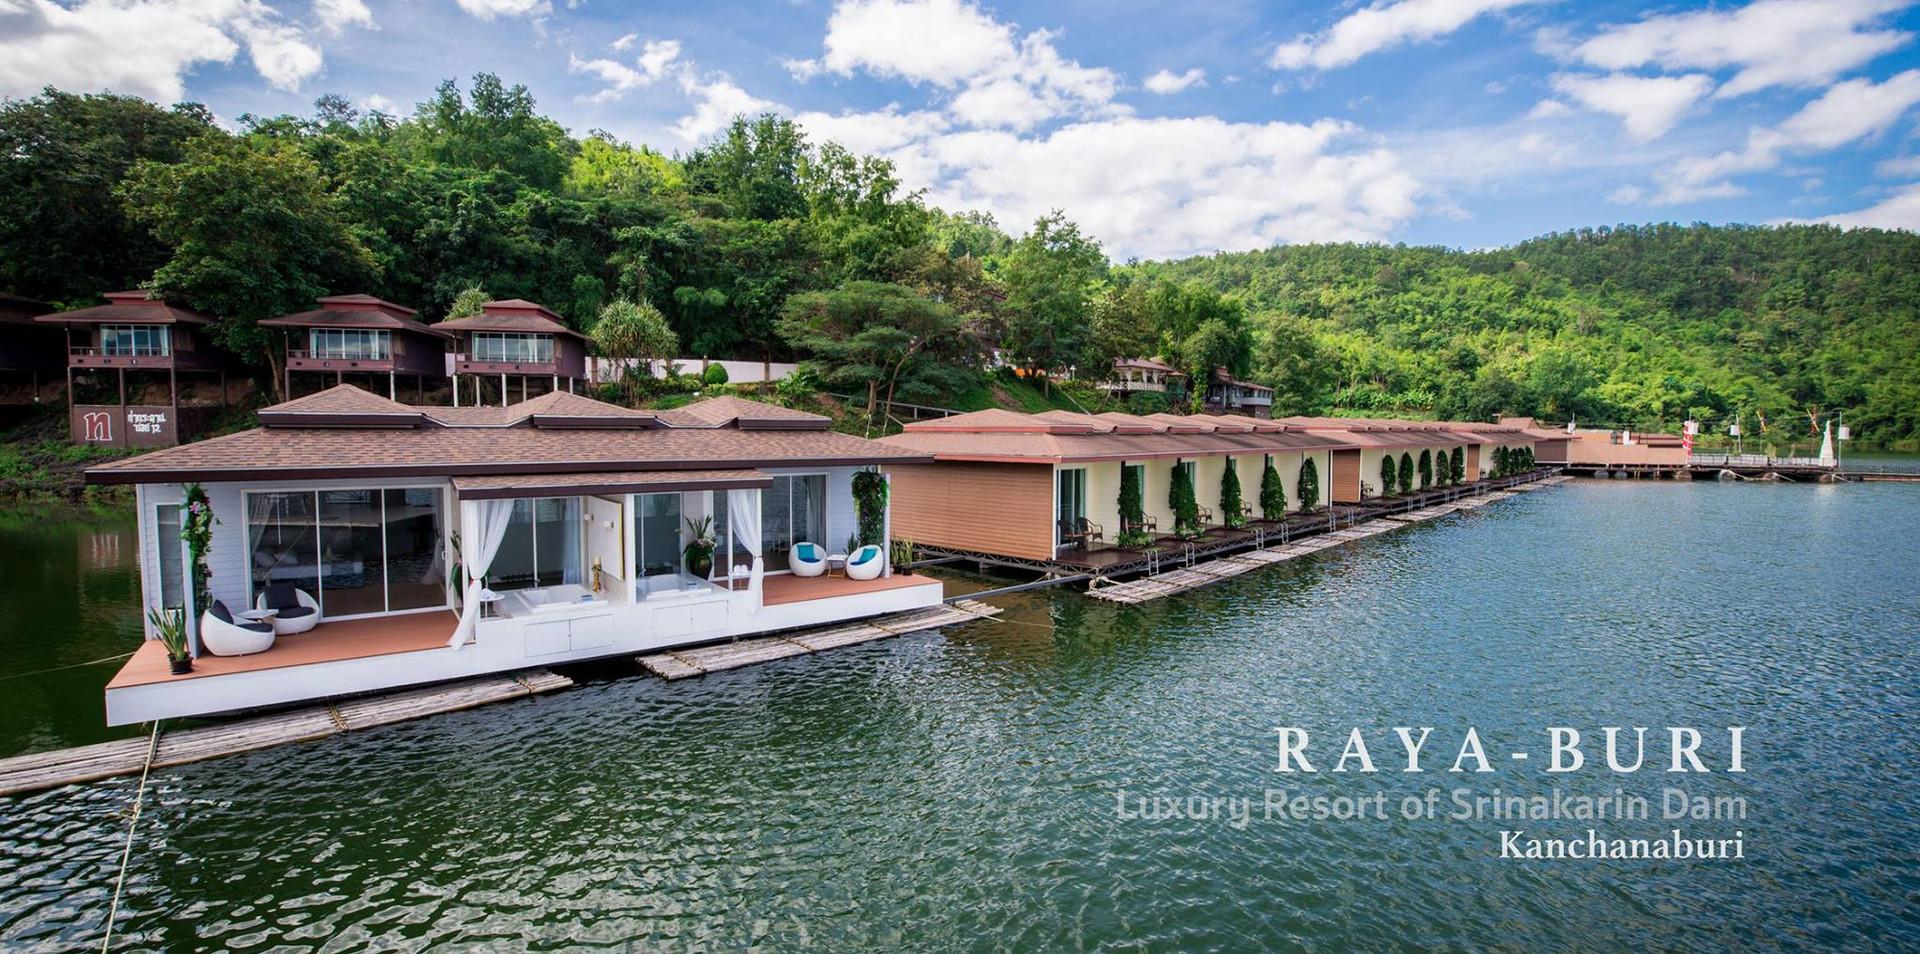 Raya-Buri Resort Project